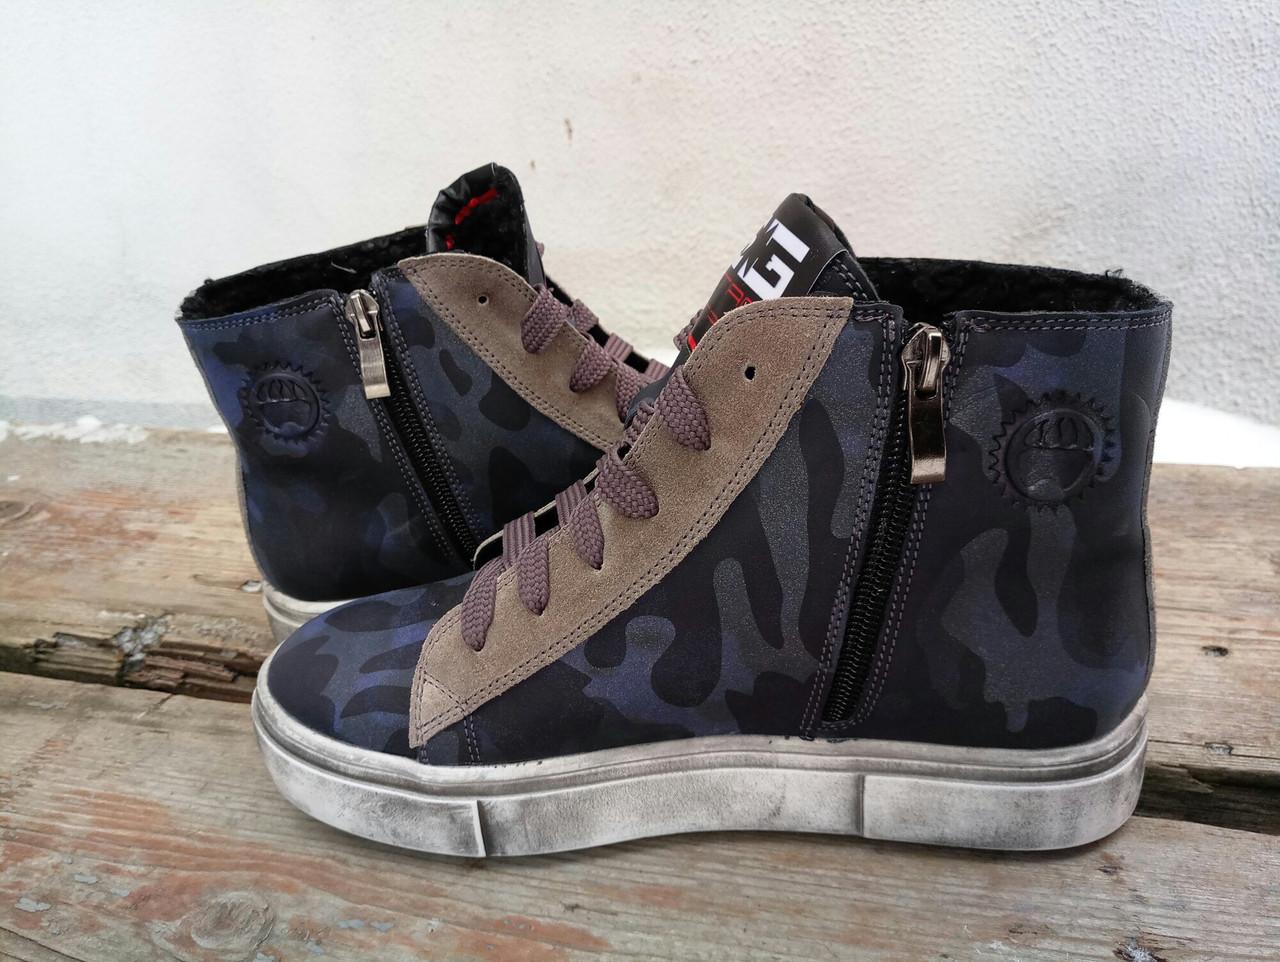 ac0a1a9c9 ... Женские ботинки-кеды демисезон,подошва тёрка. Натуральная кожа. , фото  4 ...